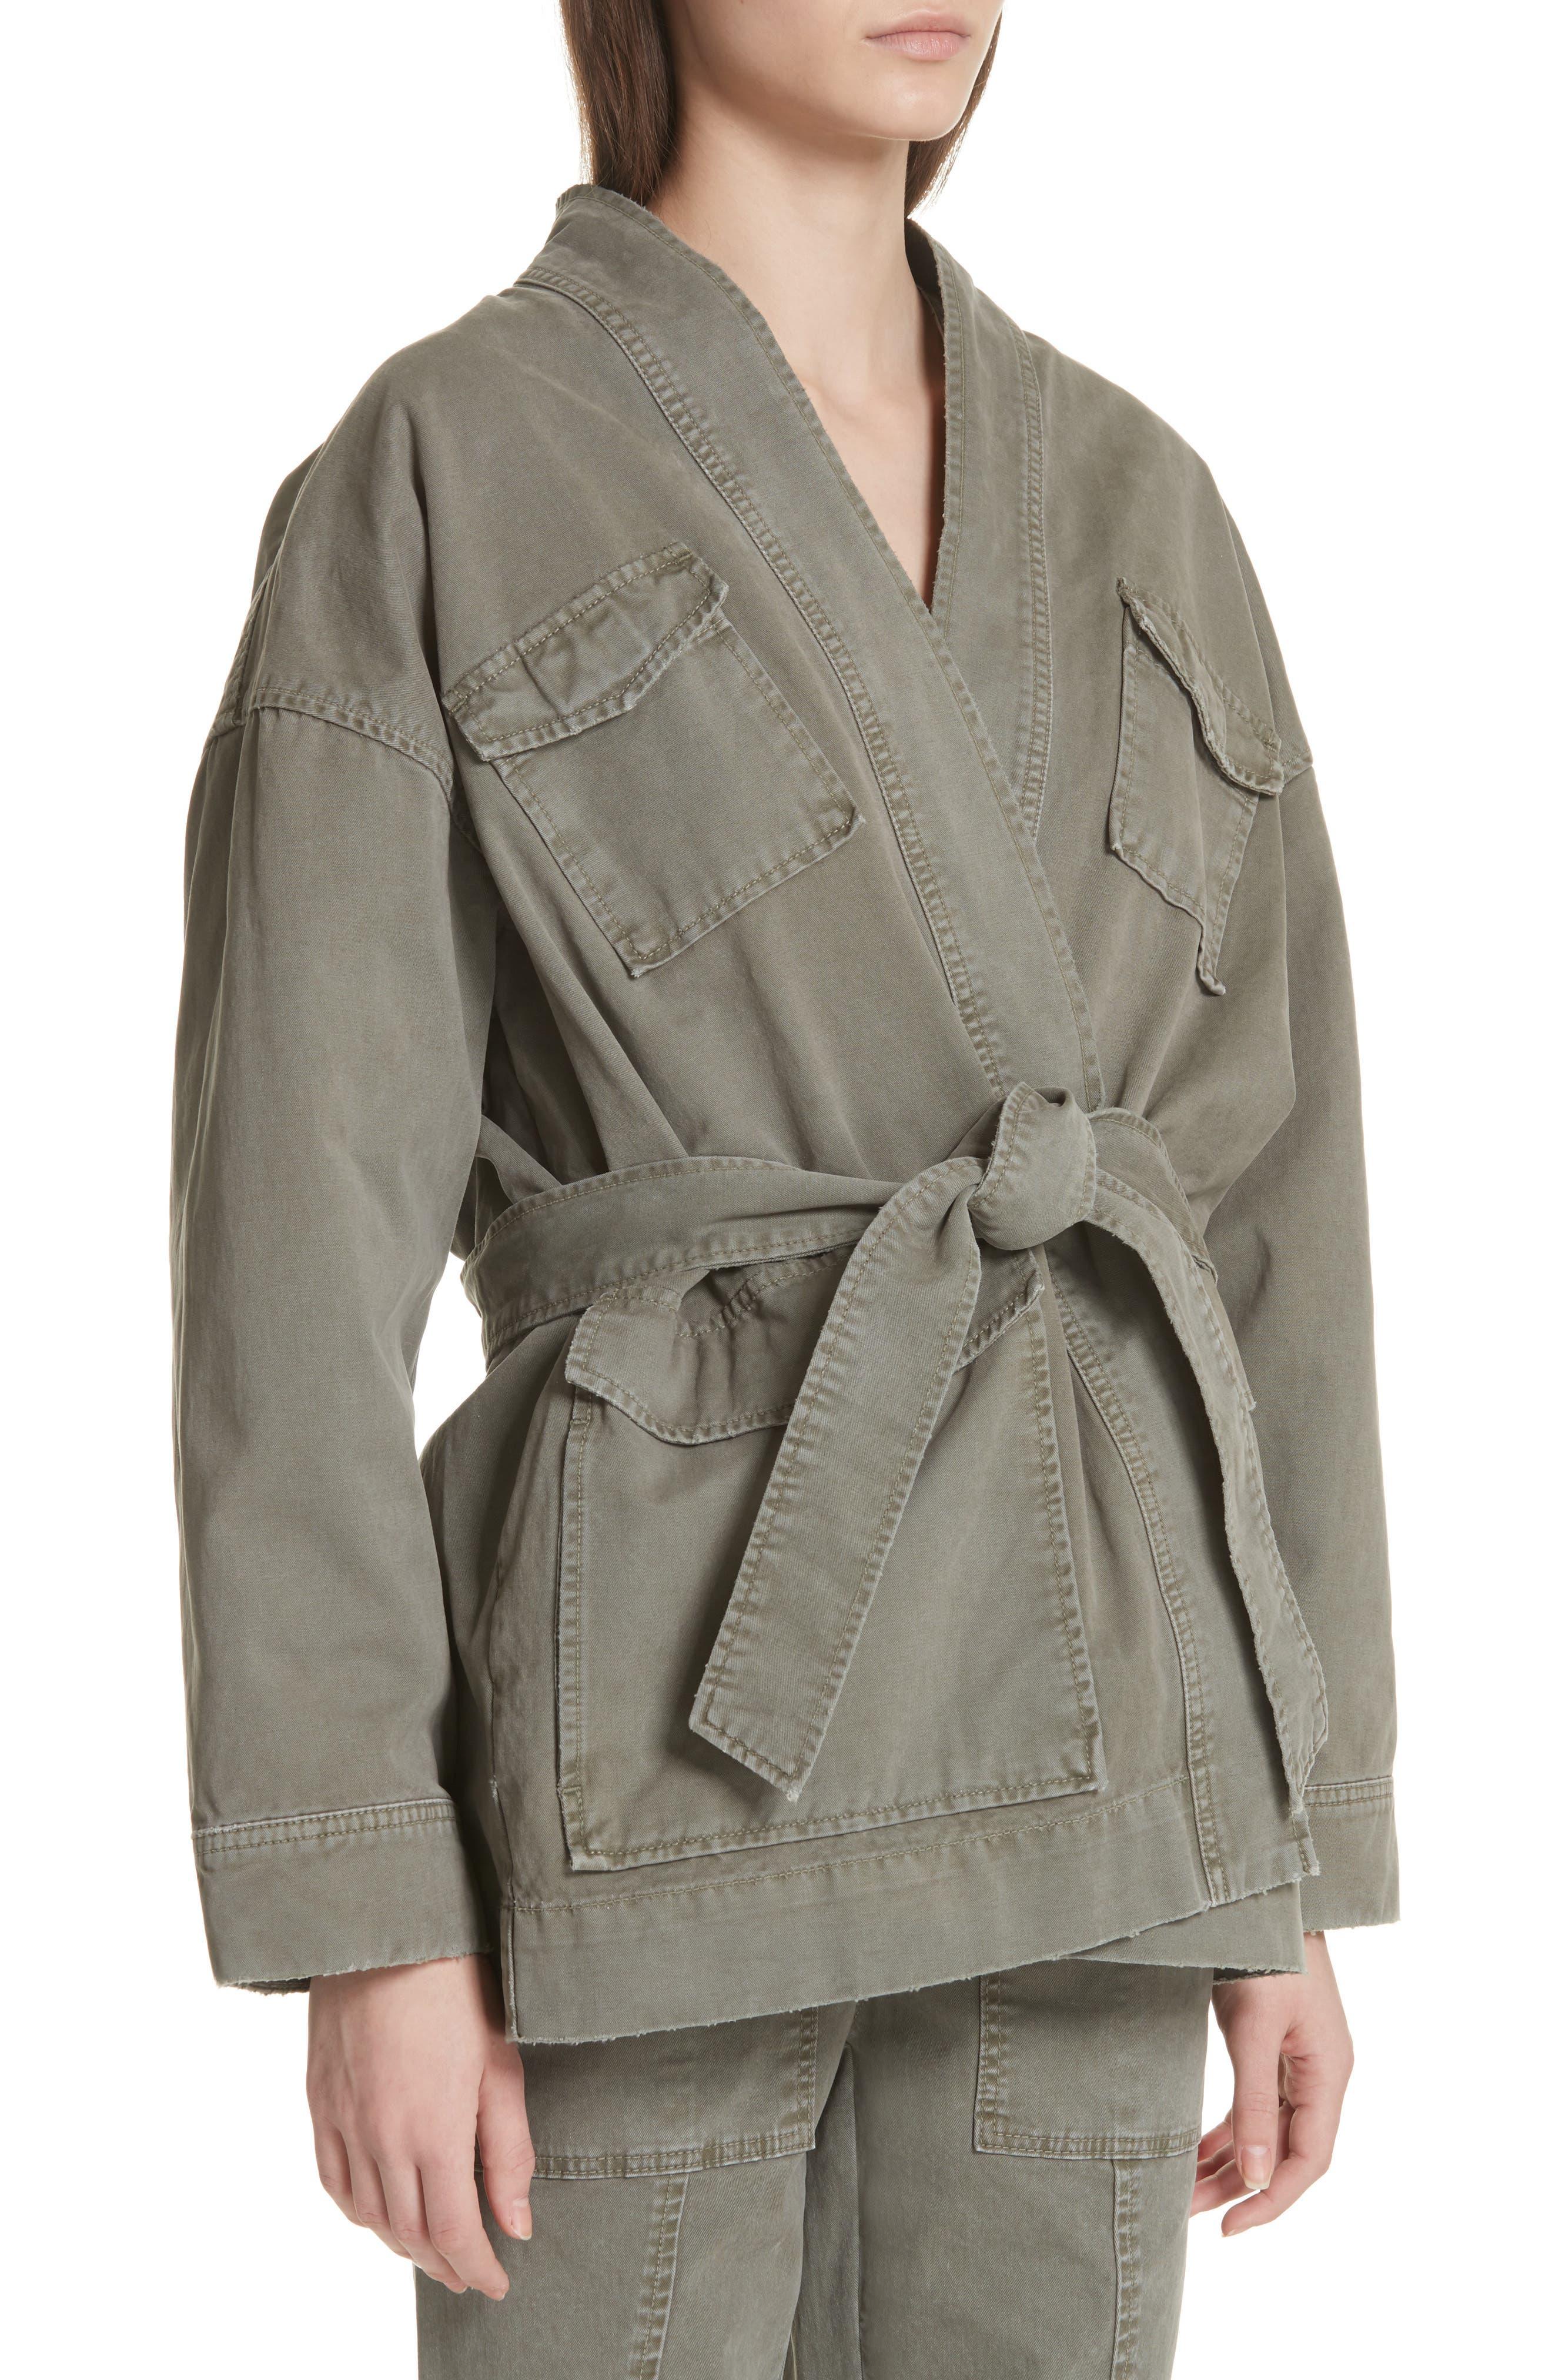 La Vie Rebecca Taylor Belted Utility Jacket